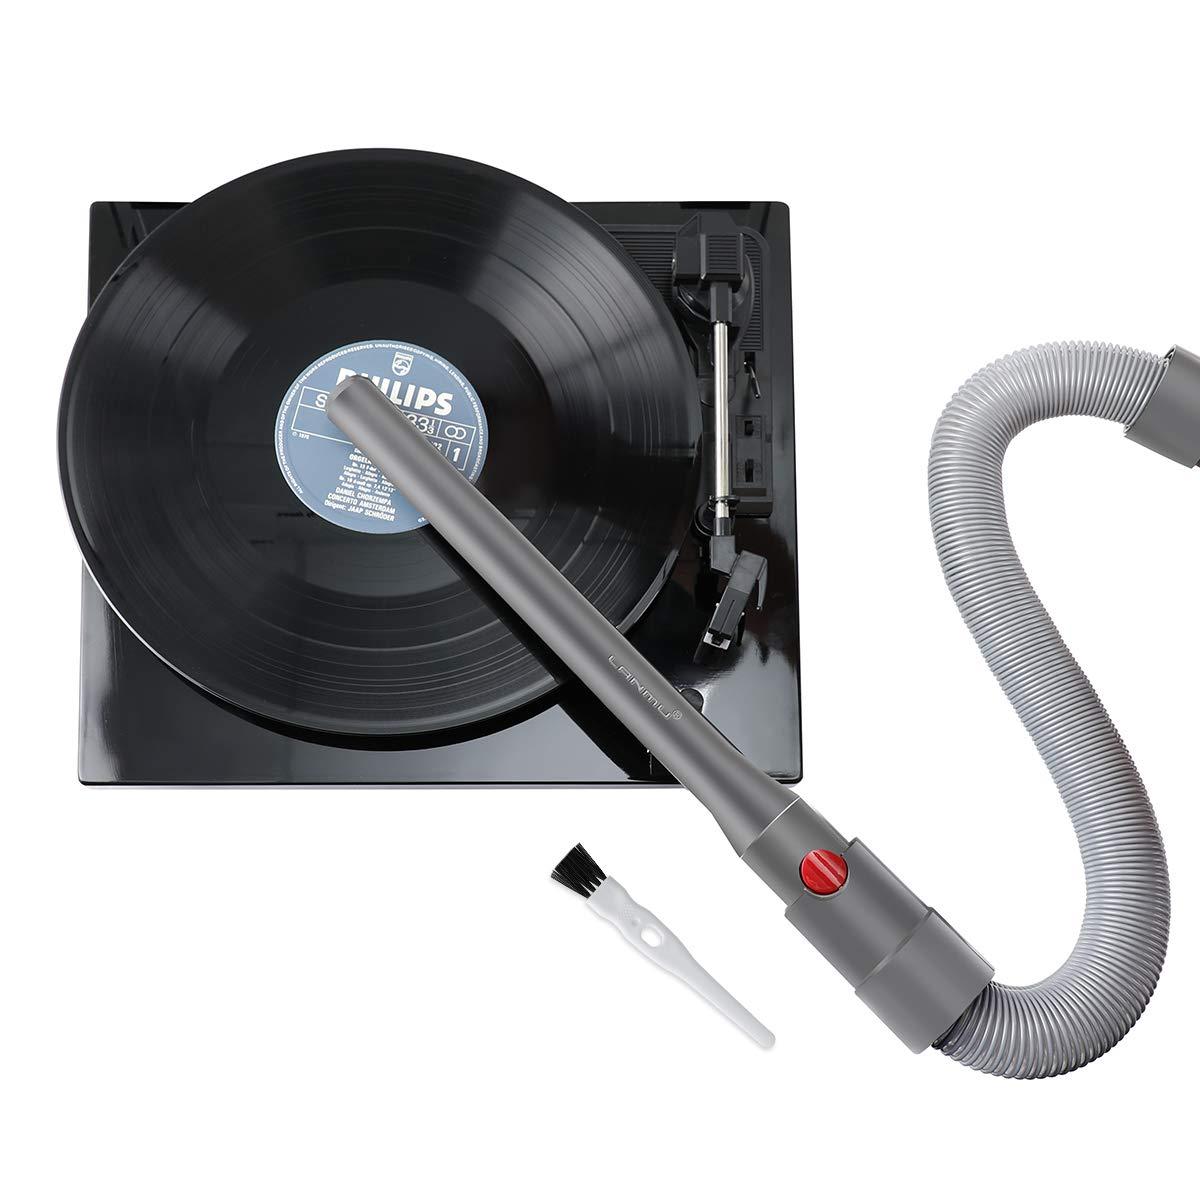 LANMU Kit de limpieza de discos de vinilo compatible con ...